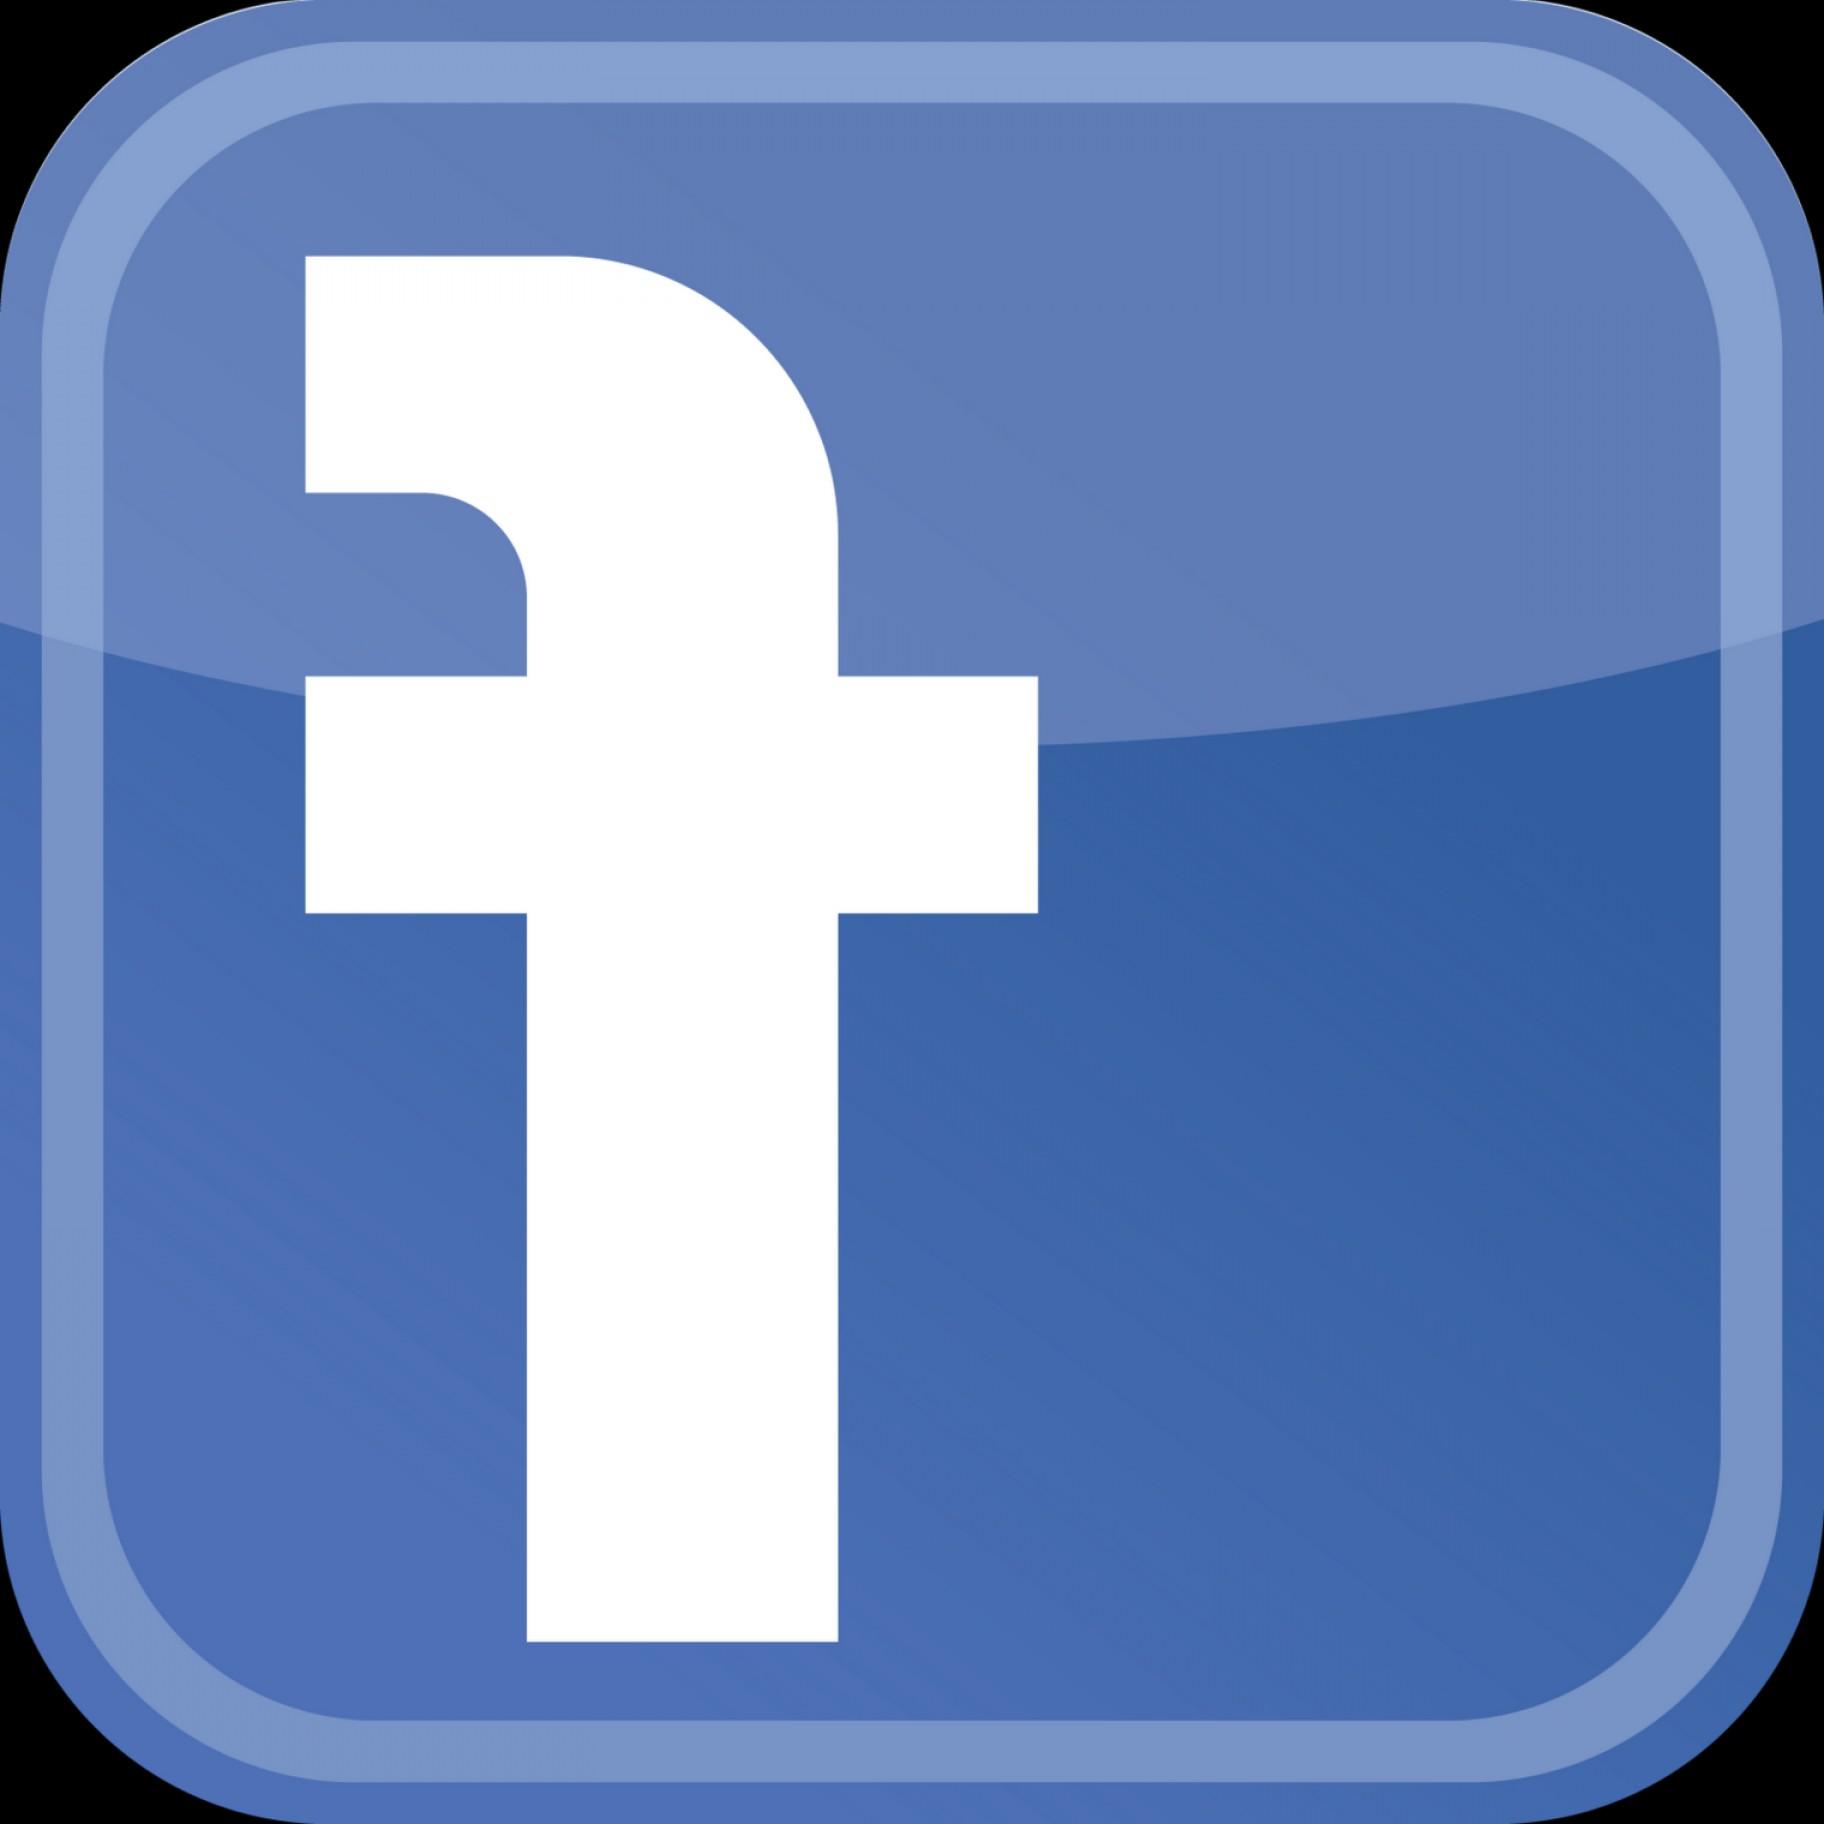 1824x1824 Facebook Logo Vector Jpg Library Download